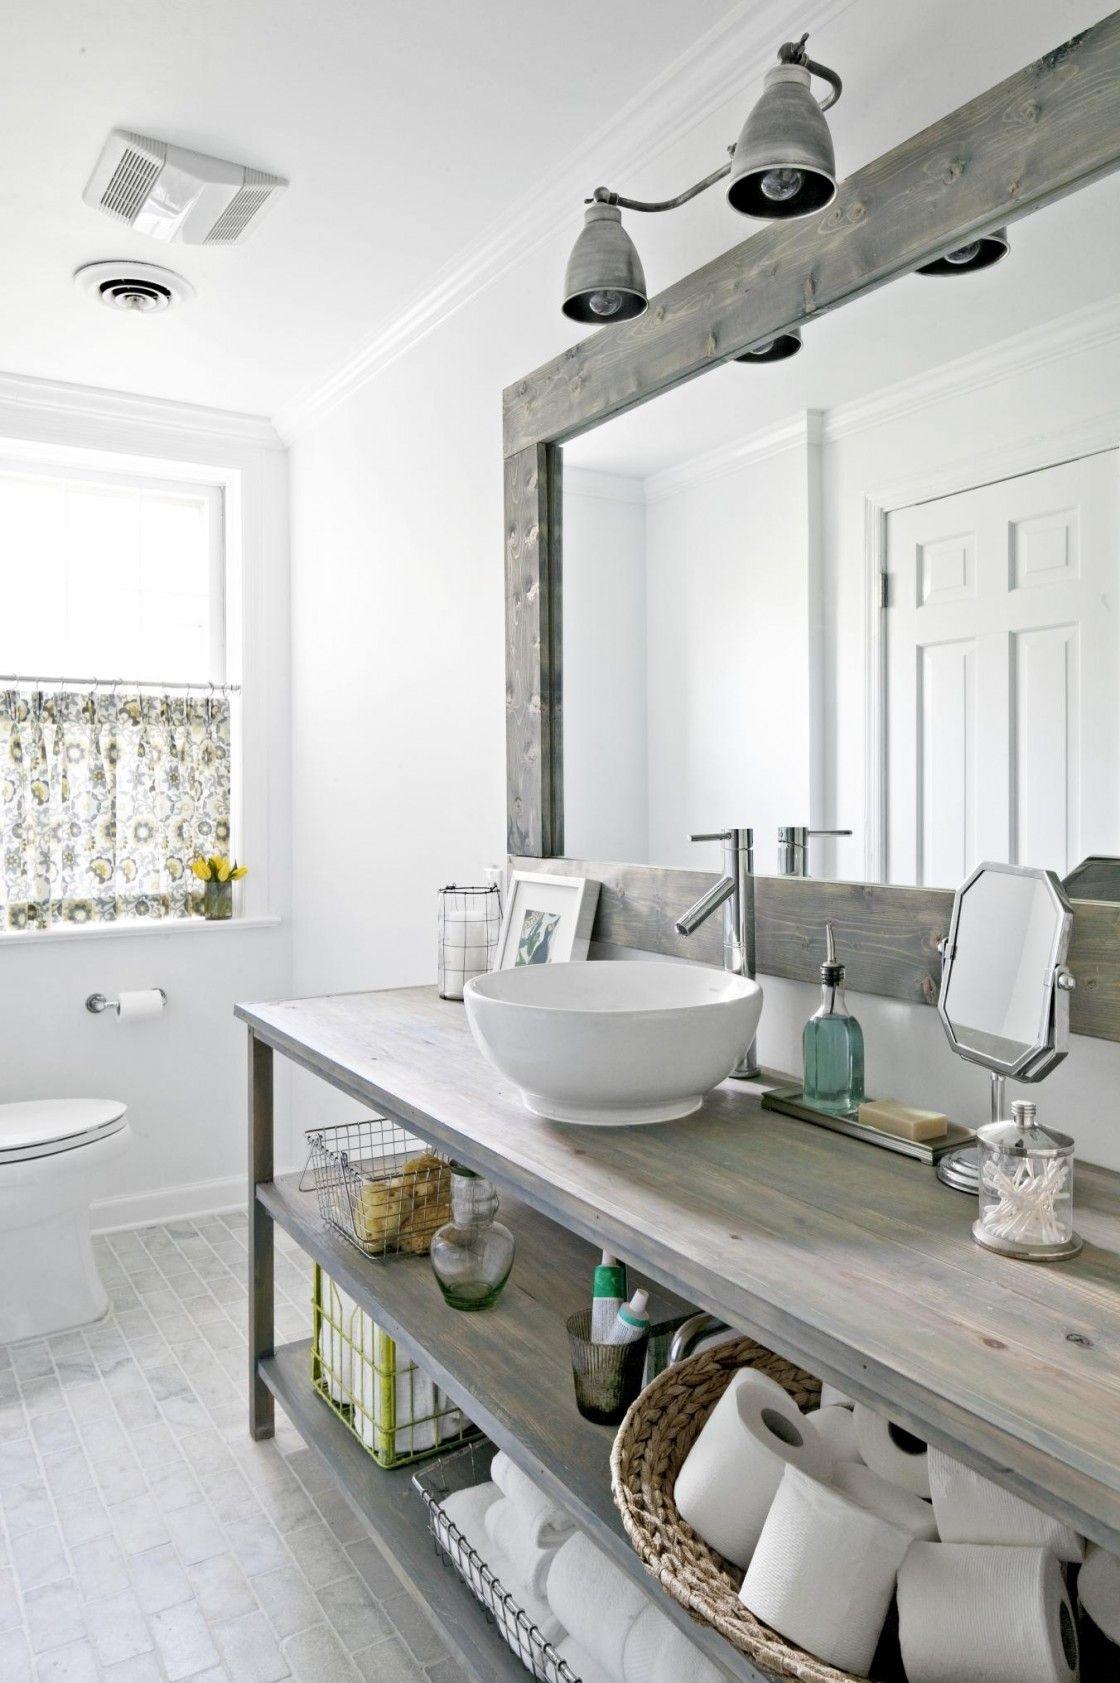 15 Astounding Industrial Bathroom Designs: 15 Astounding Industrial ...